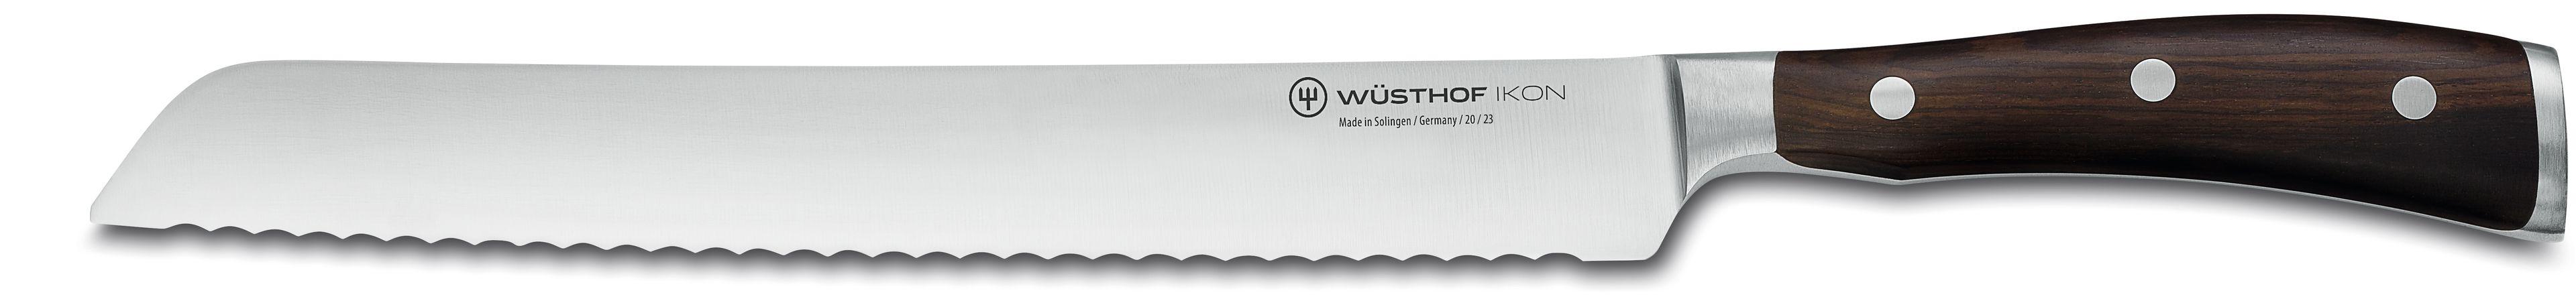 Wüsthof Brotmesser Ikon 23 cm